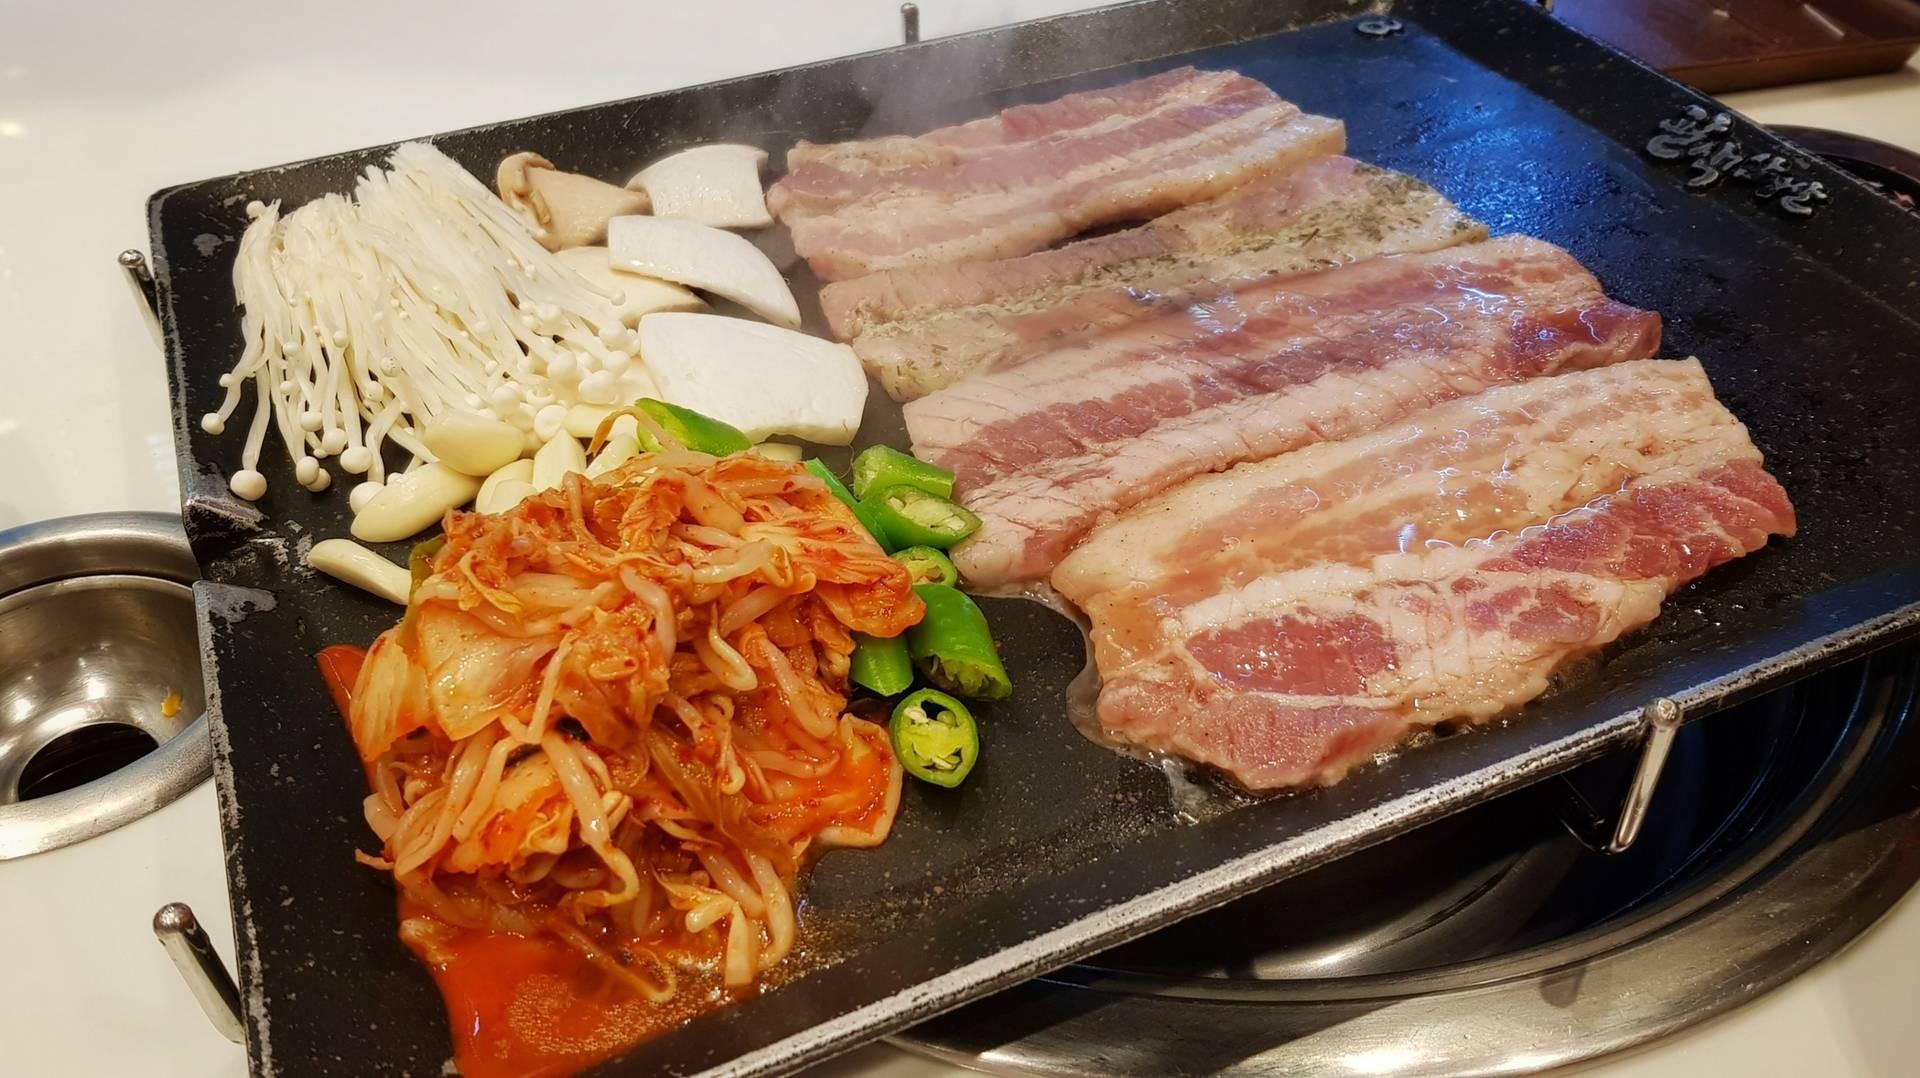 Palsaik korean bbq สยามเซ็นเตอร์